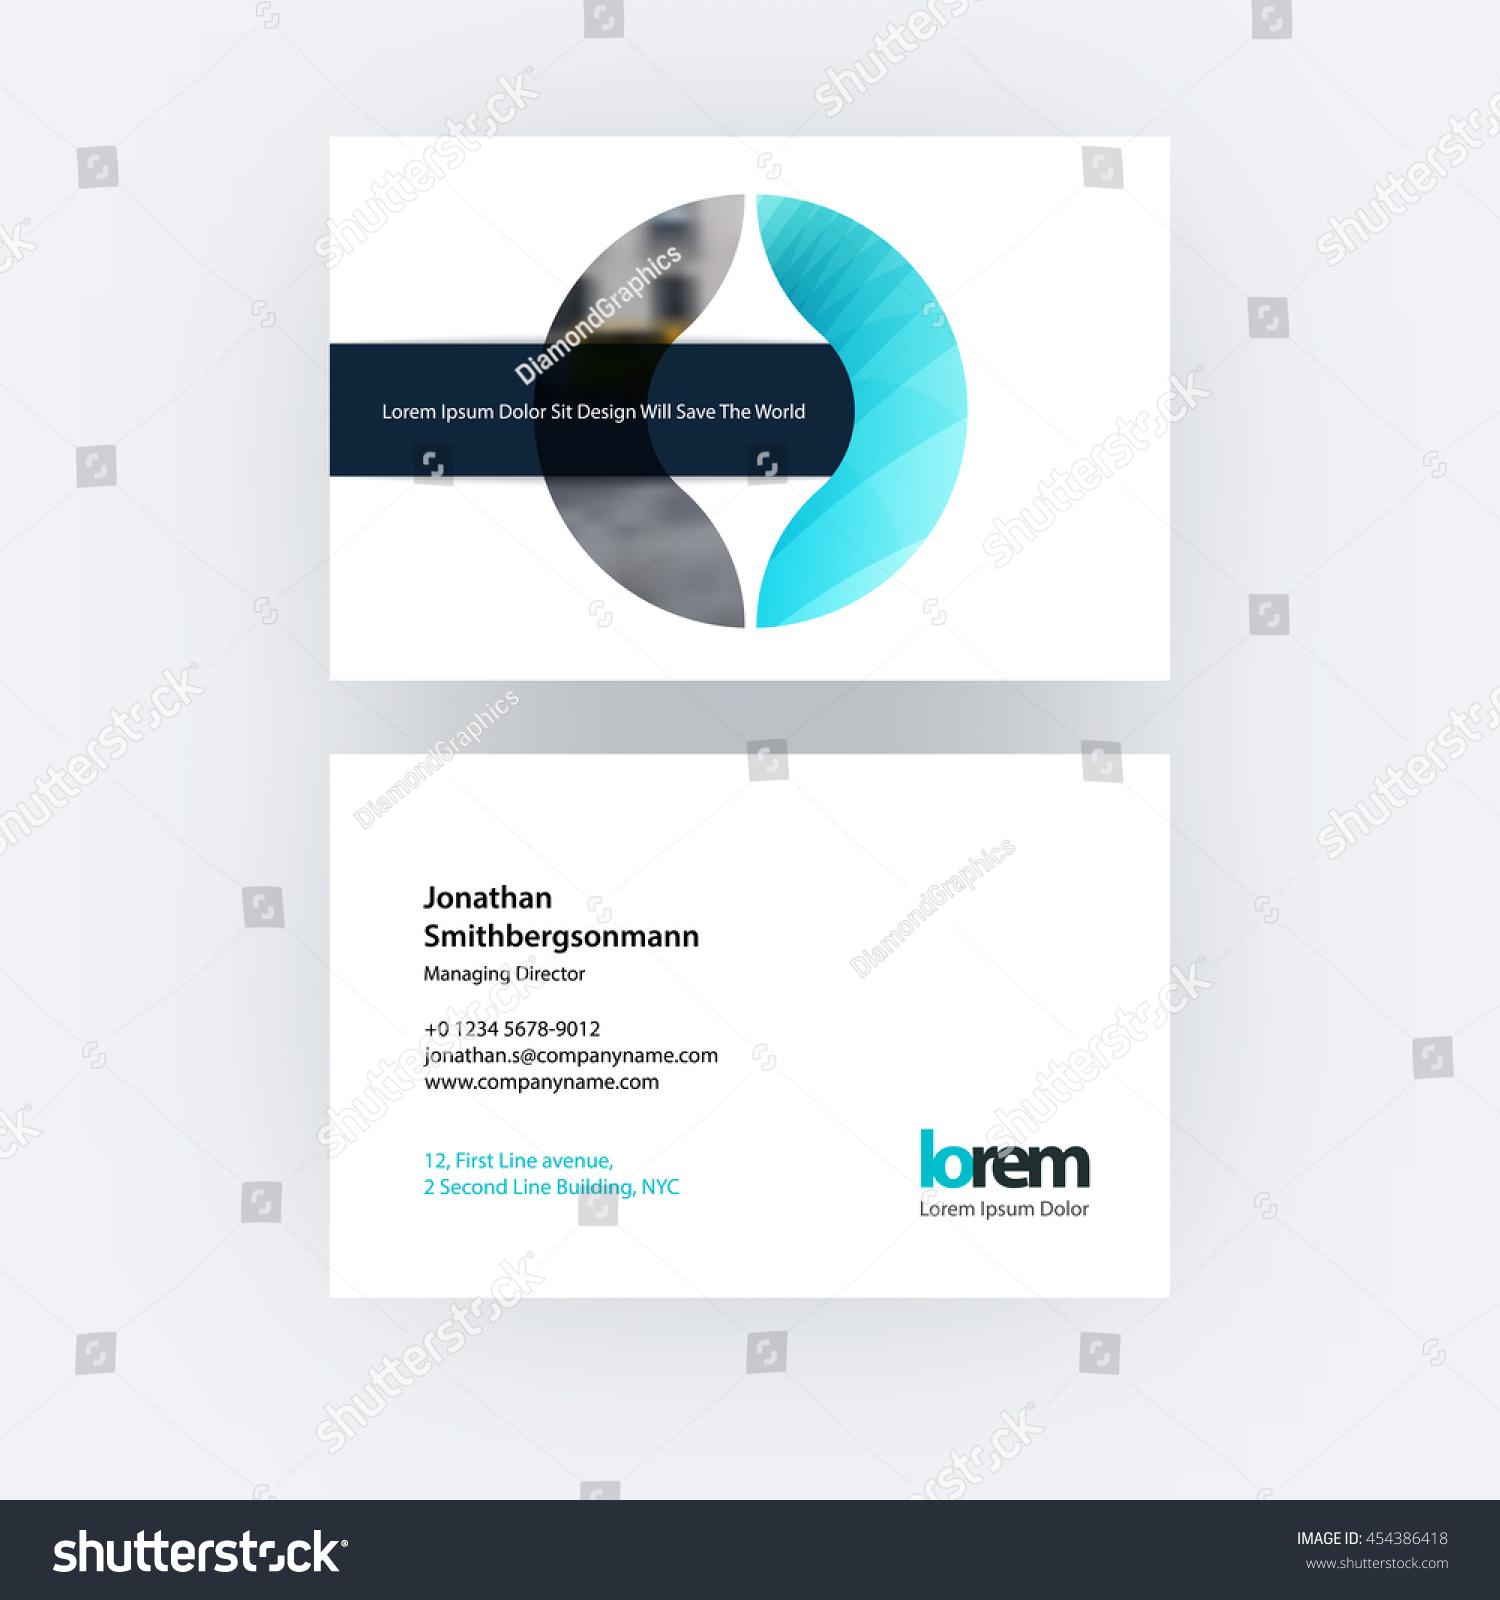 vector business card template circle geometric stock vector